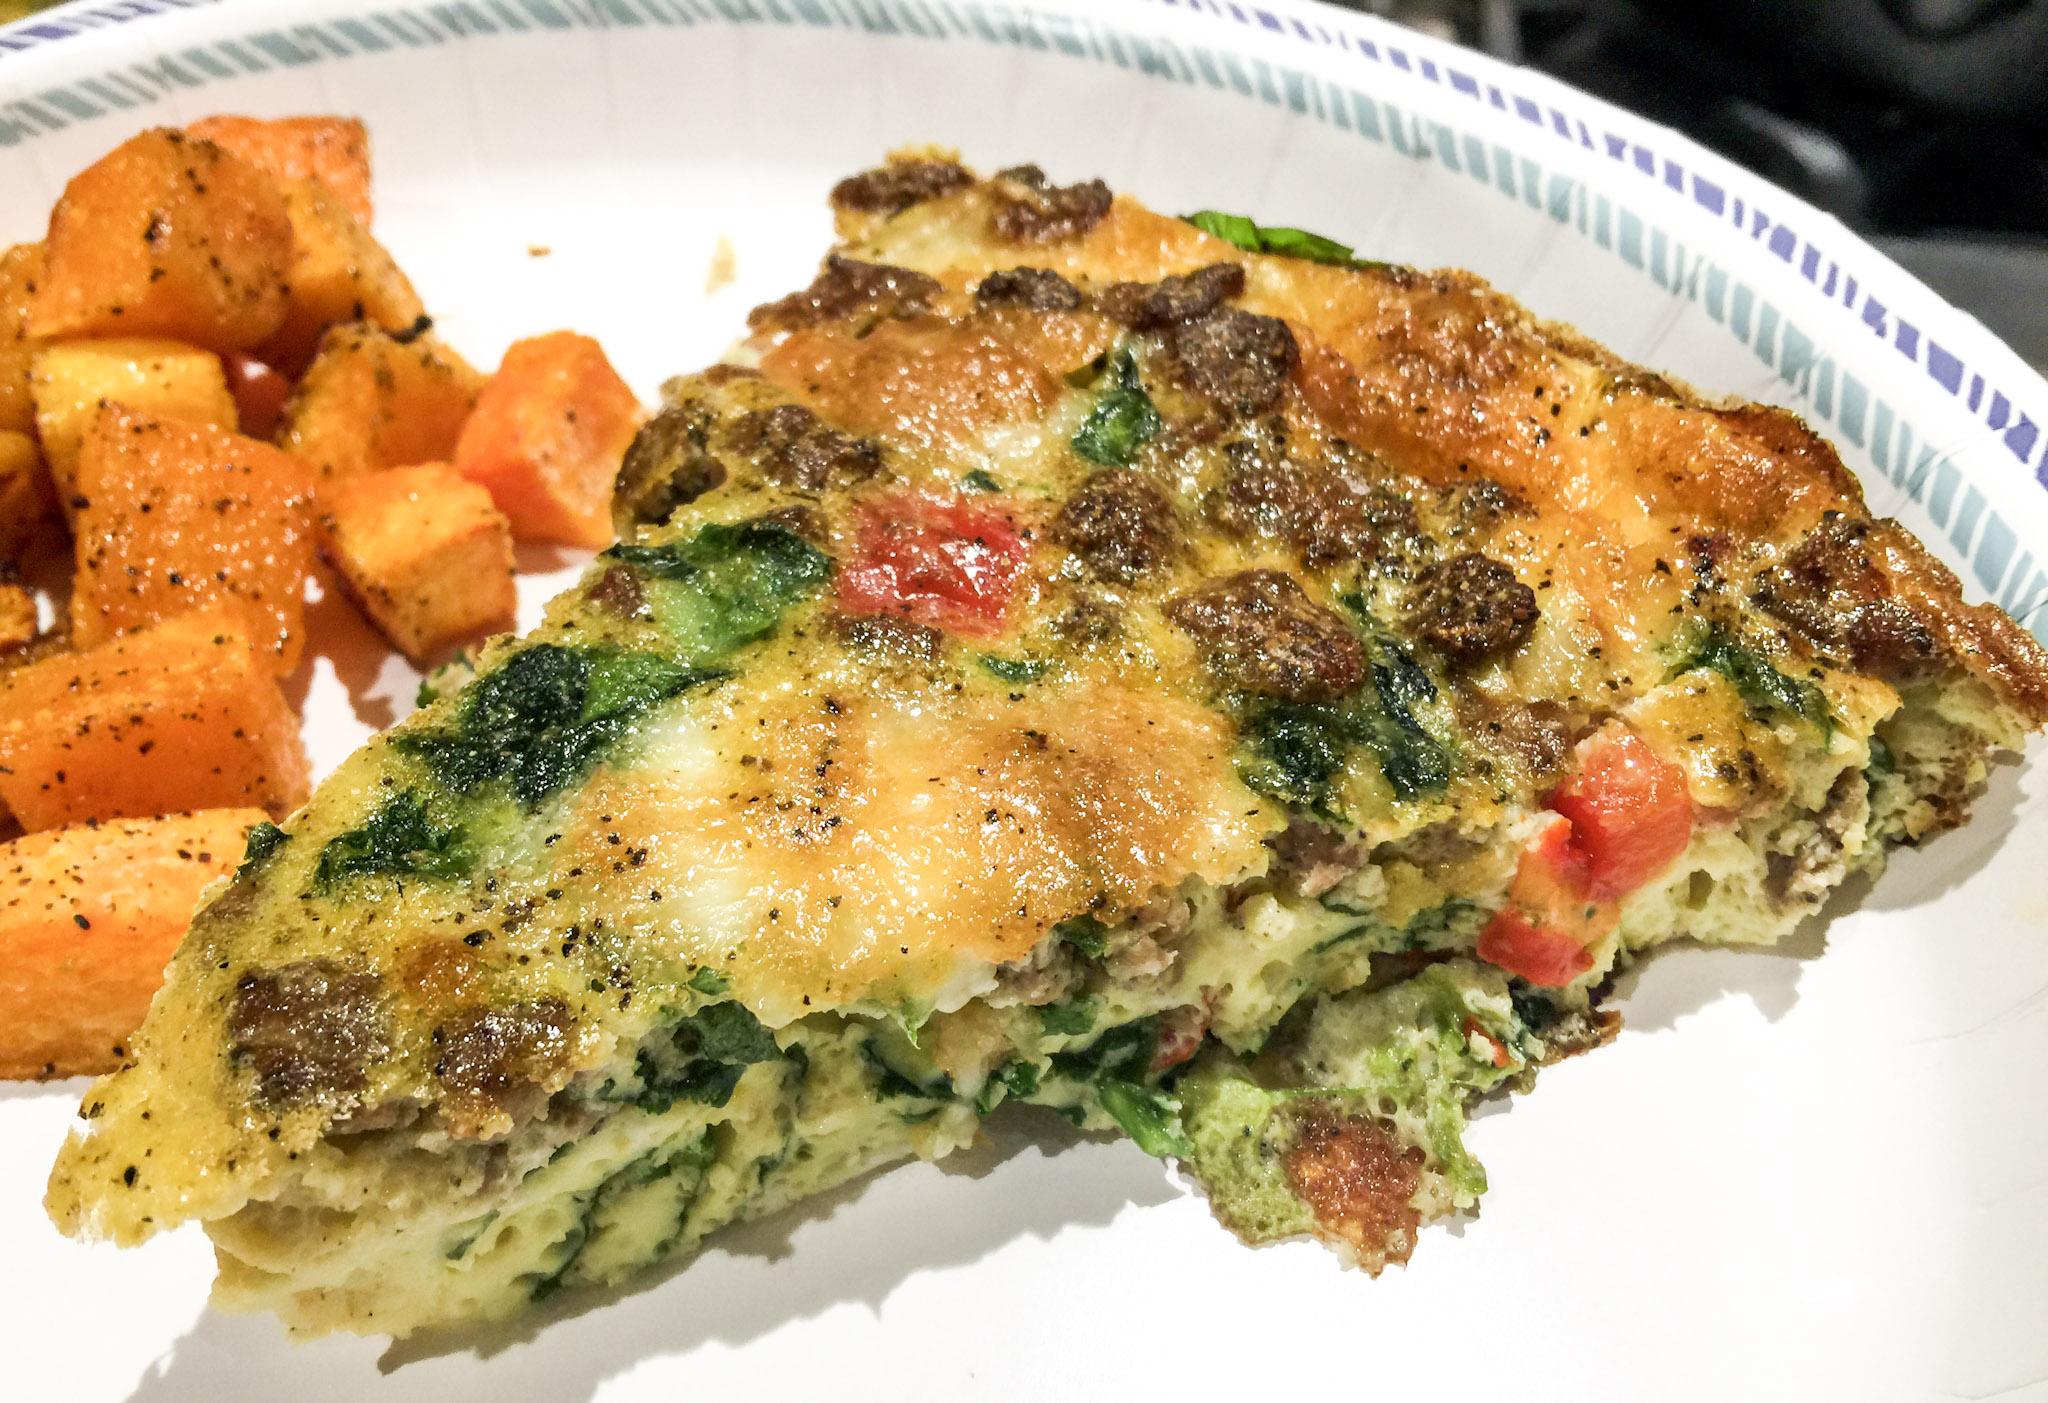 Blue apron quiche artichoke - Thirty Minute Turkey Sausage Havarti Veggie Frittata Simply Taralynn